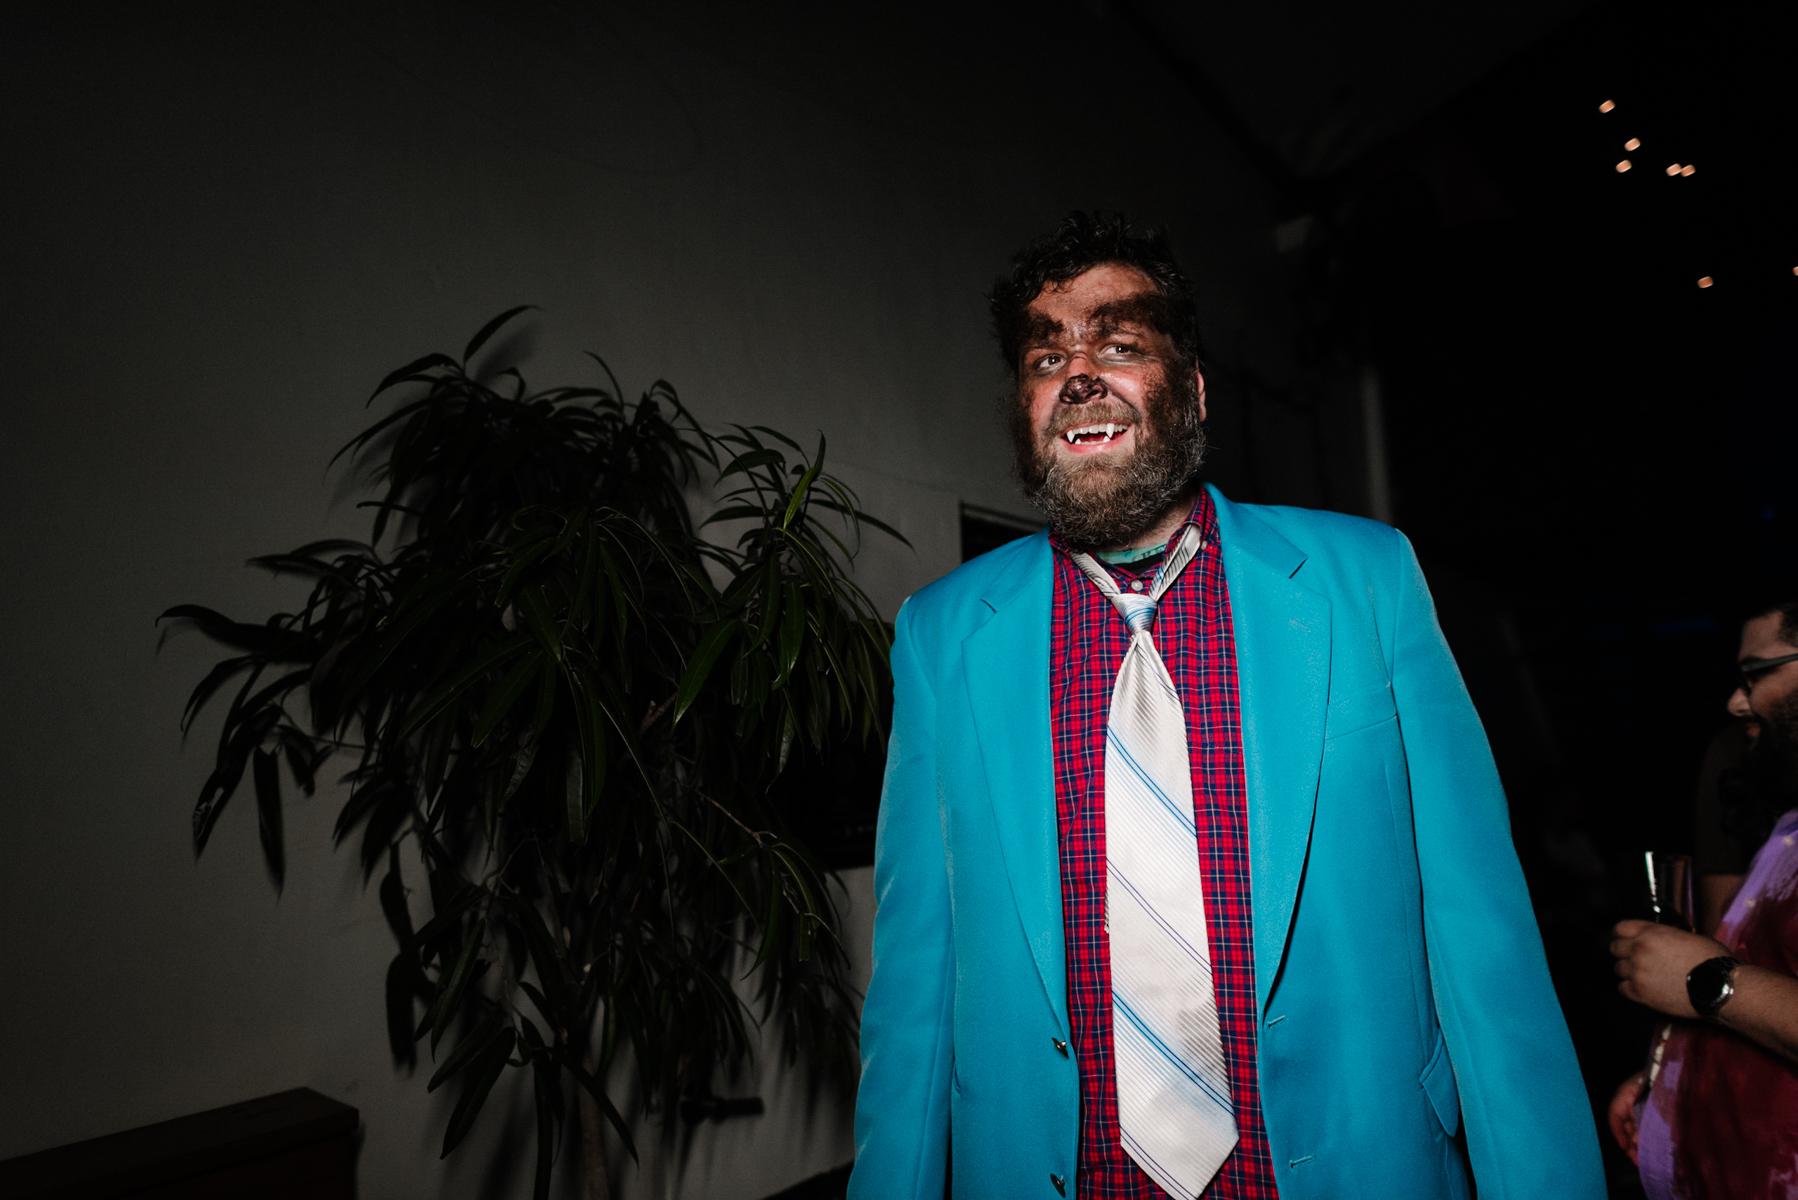 Zombie_Prom-6.jpg